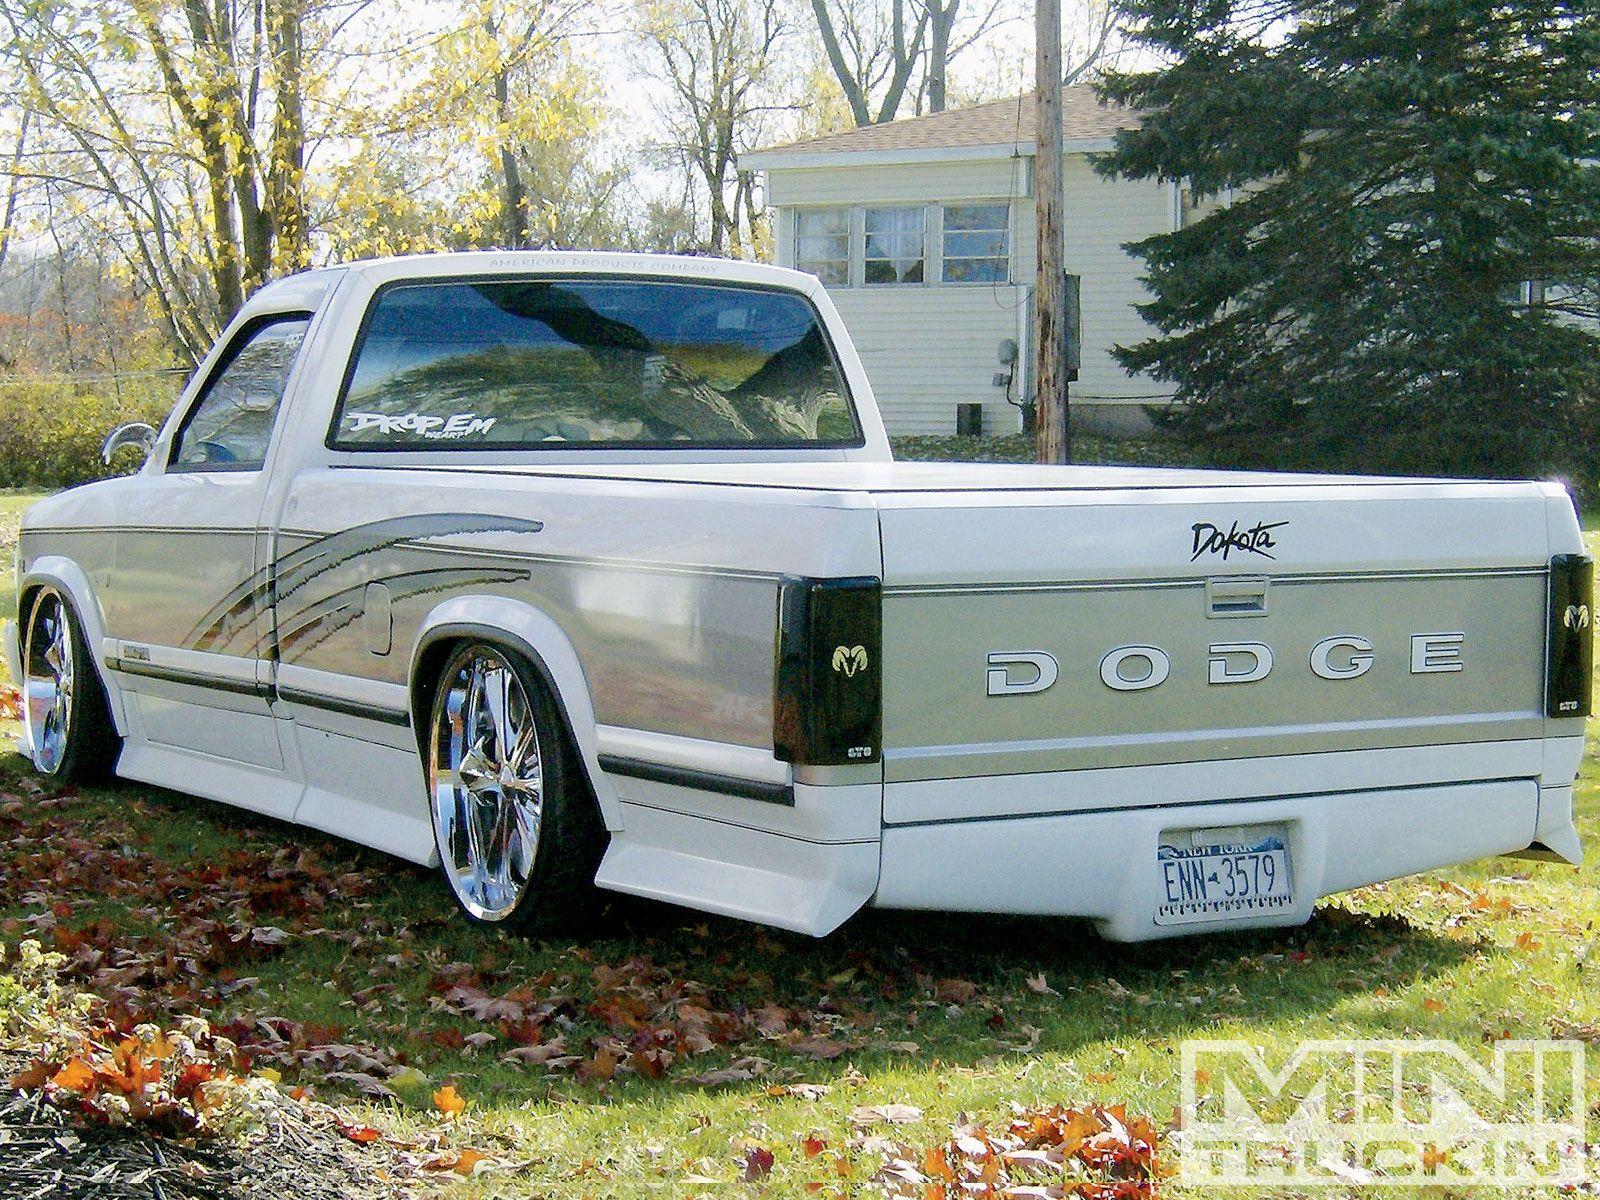 Slammed Dodge Dakota With Images Dodge Dakota Dodge Dakota Truck